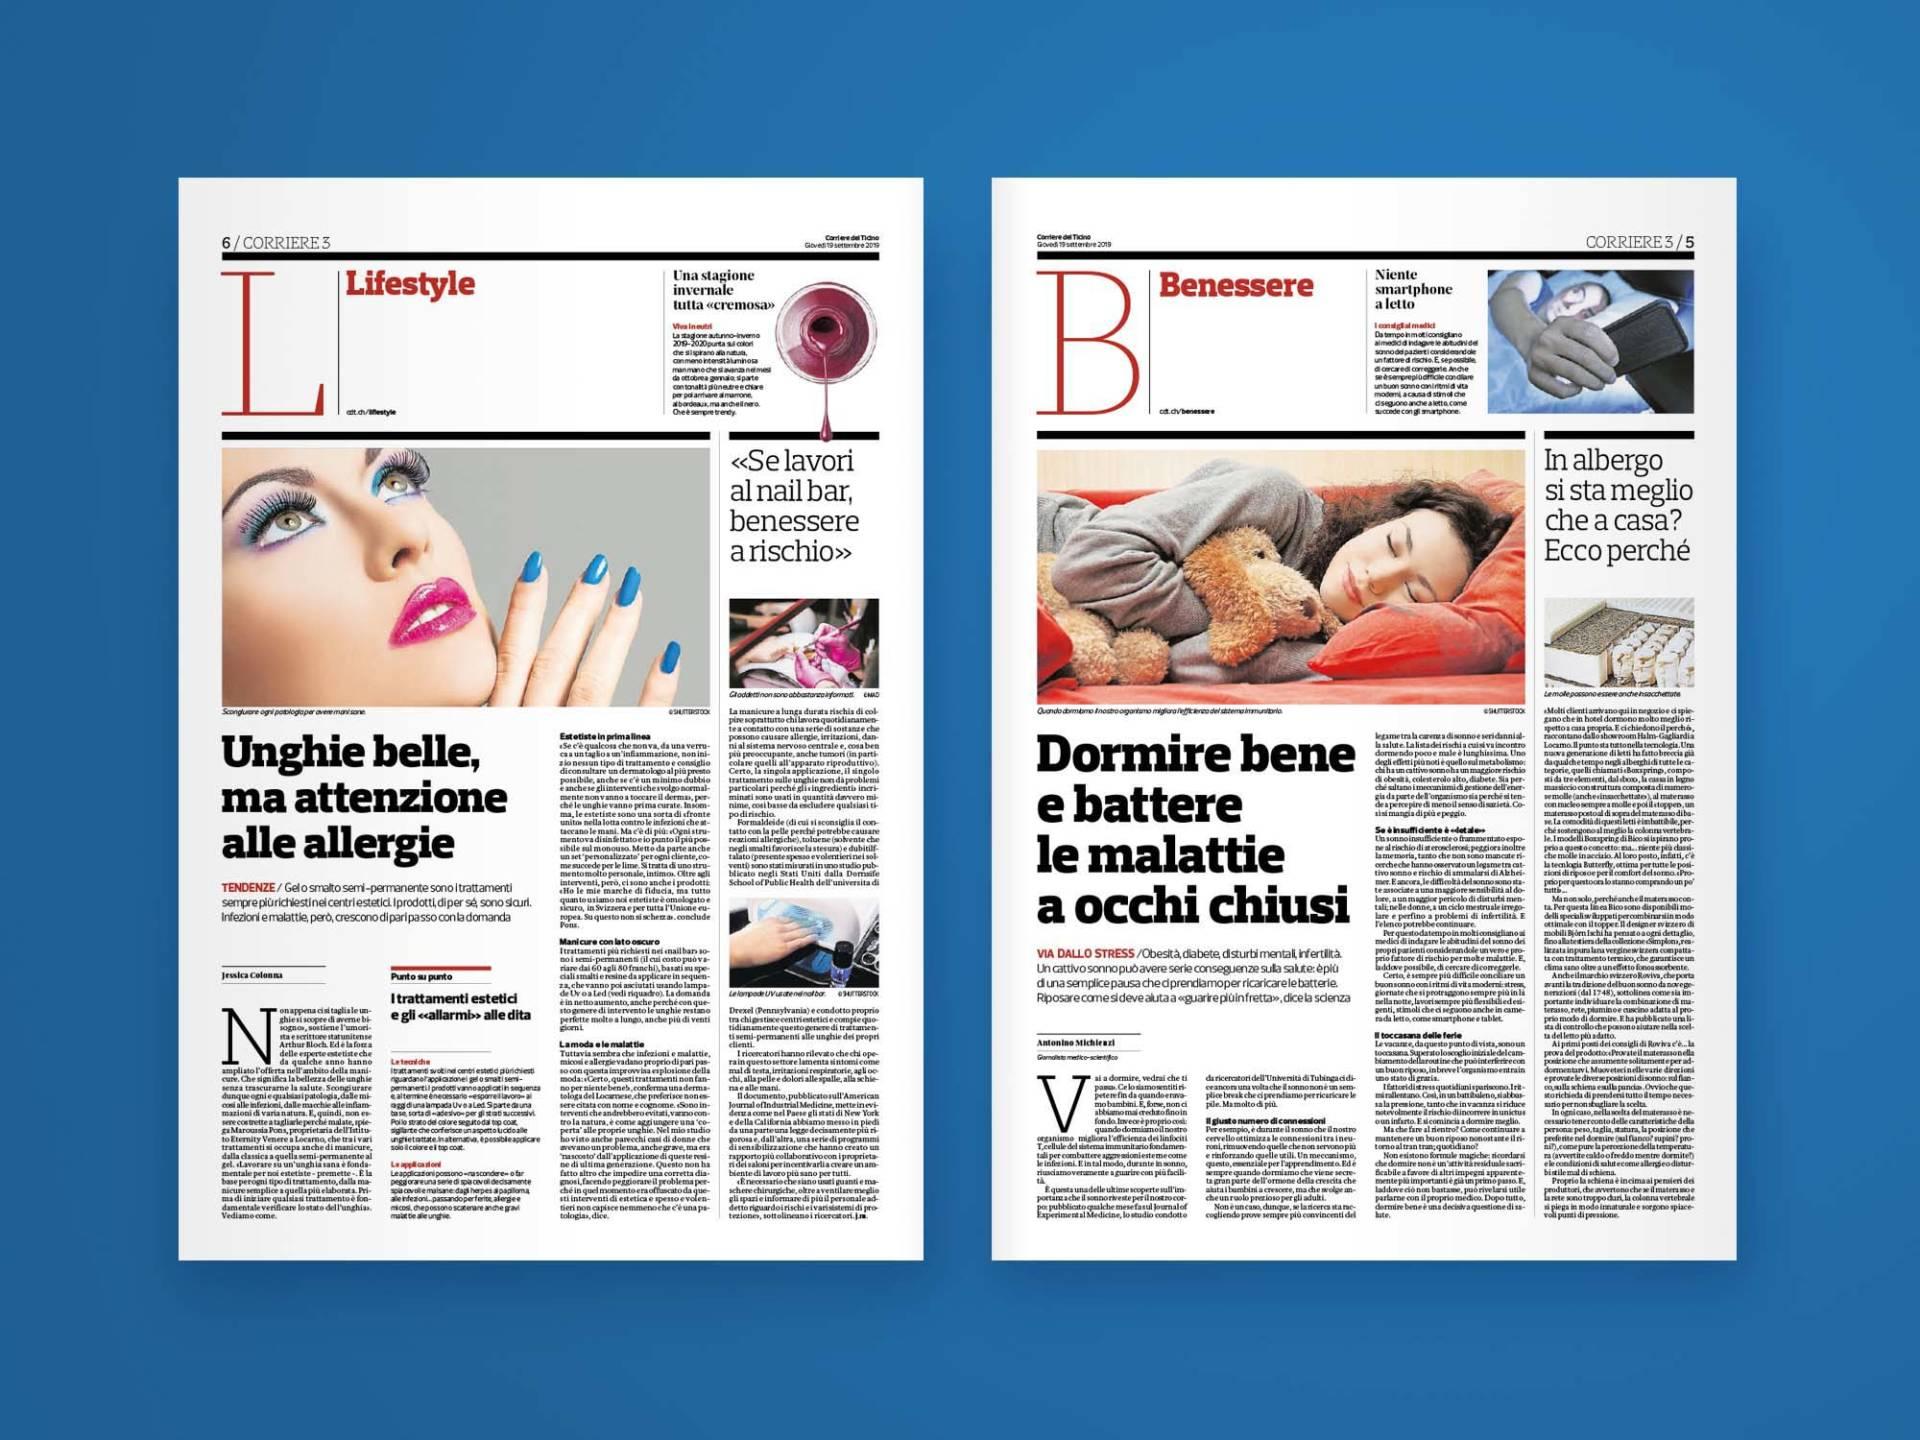 Corriere_3_03_Wenceslau_News_Design